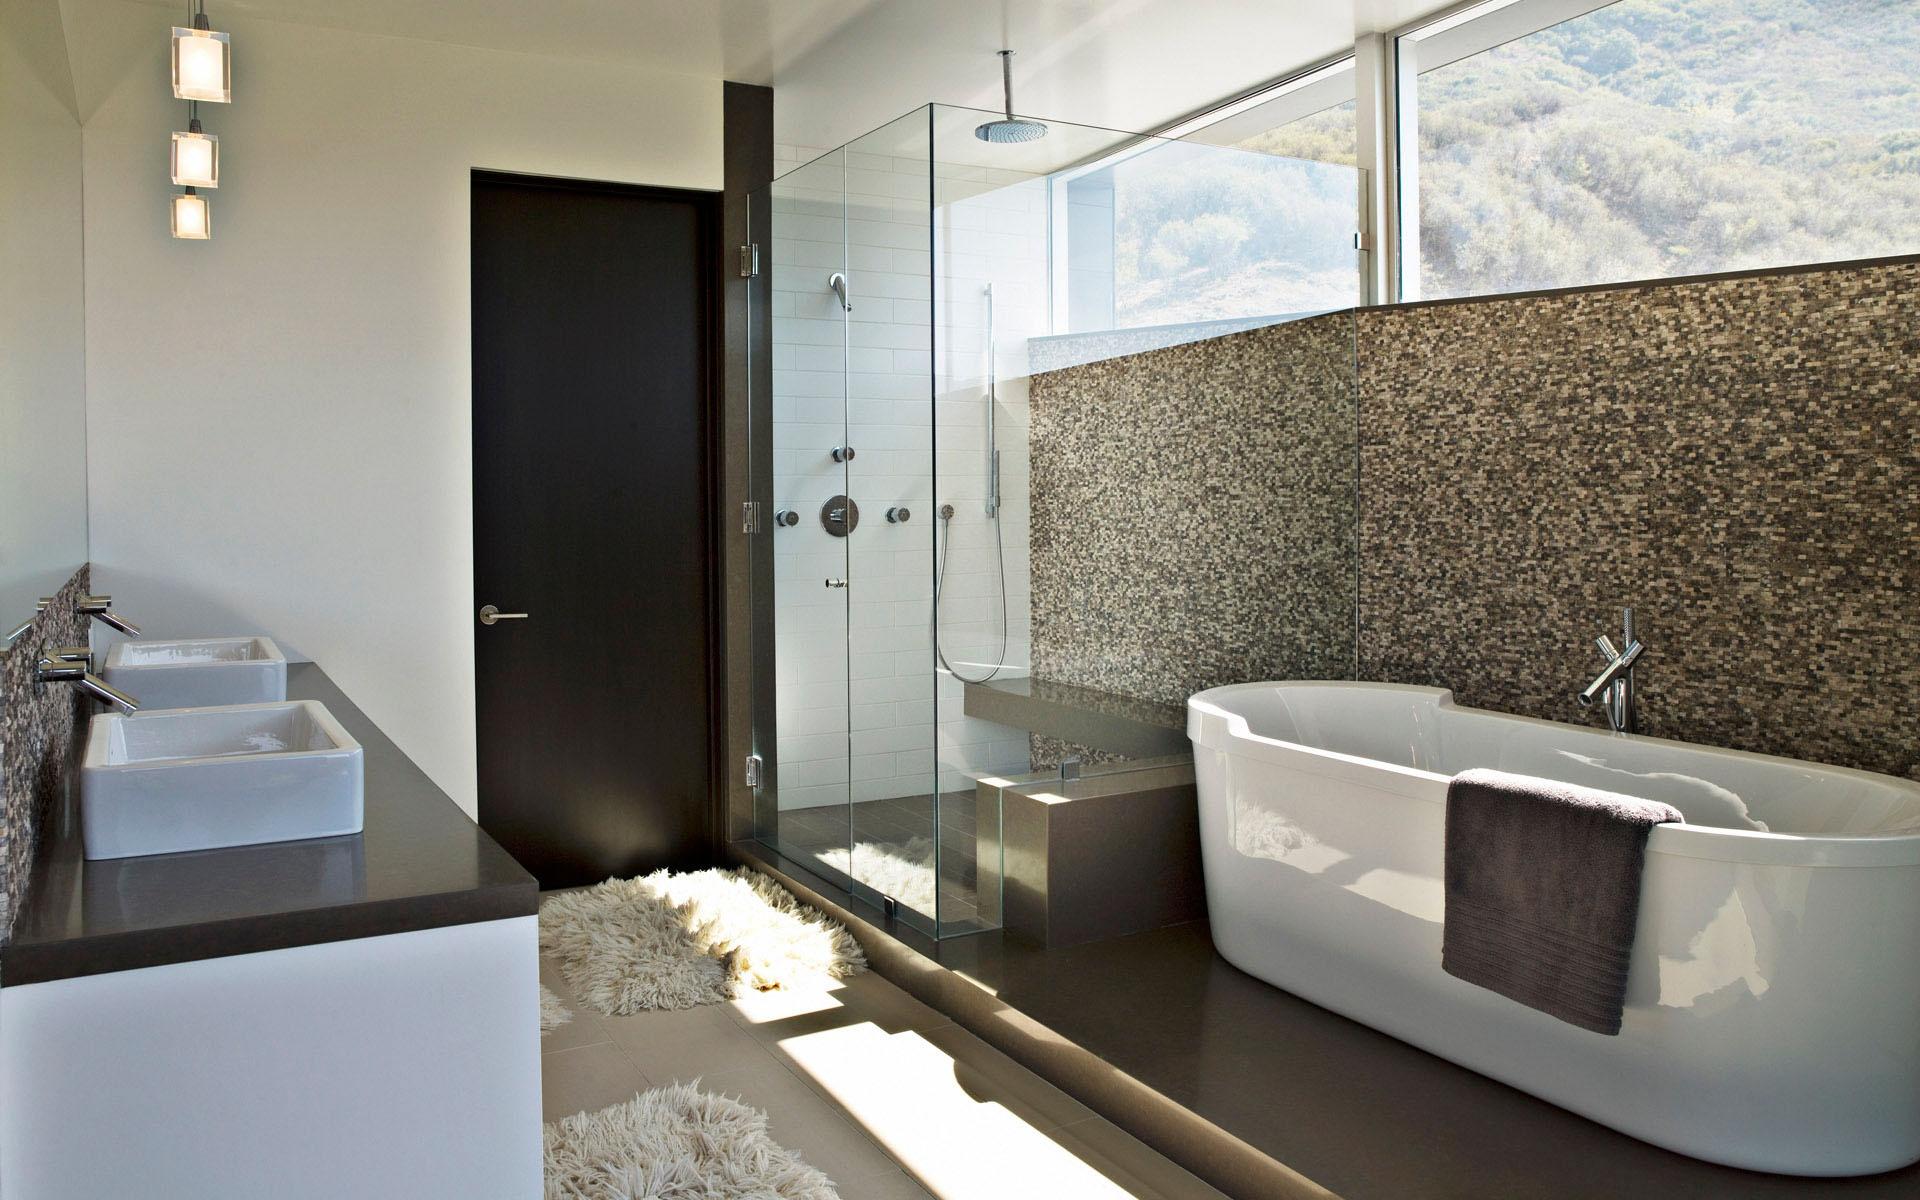 Great-bathroom-designs-for-small-spaces-attics